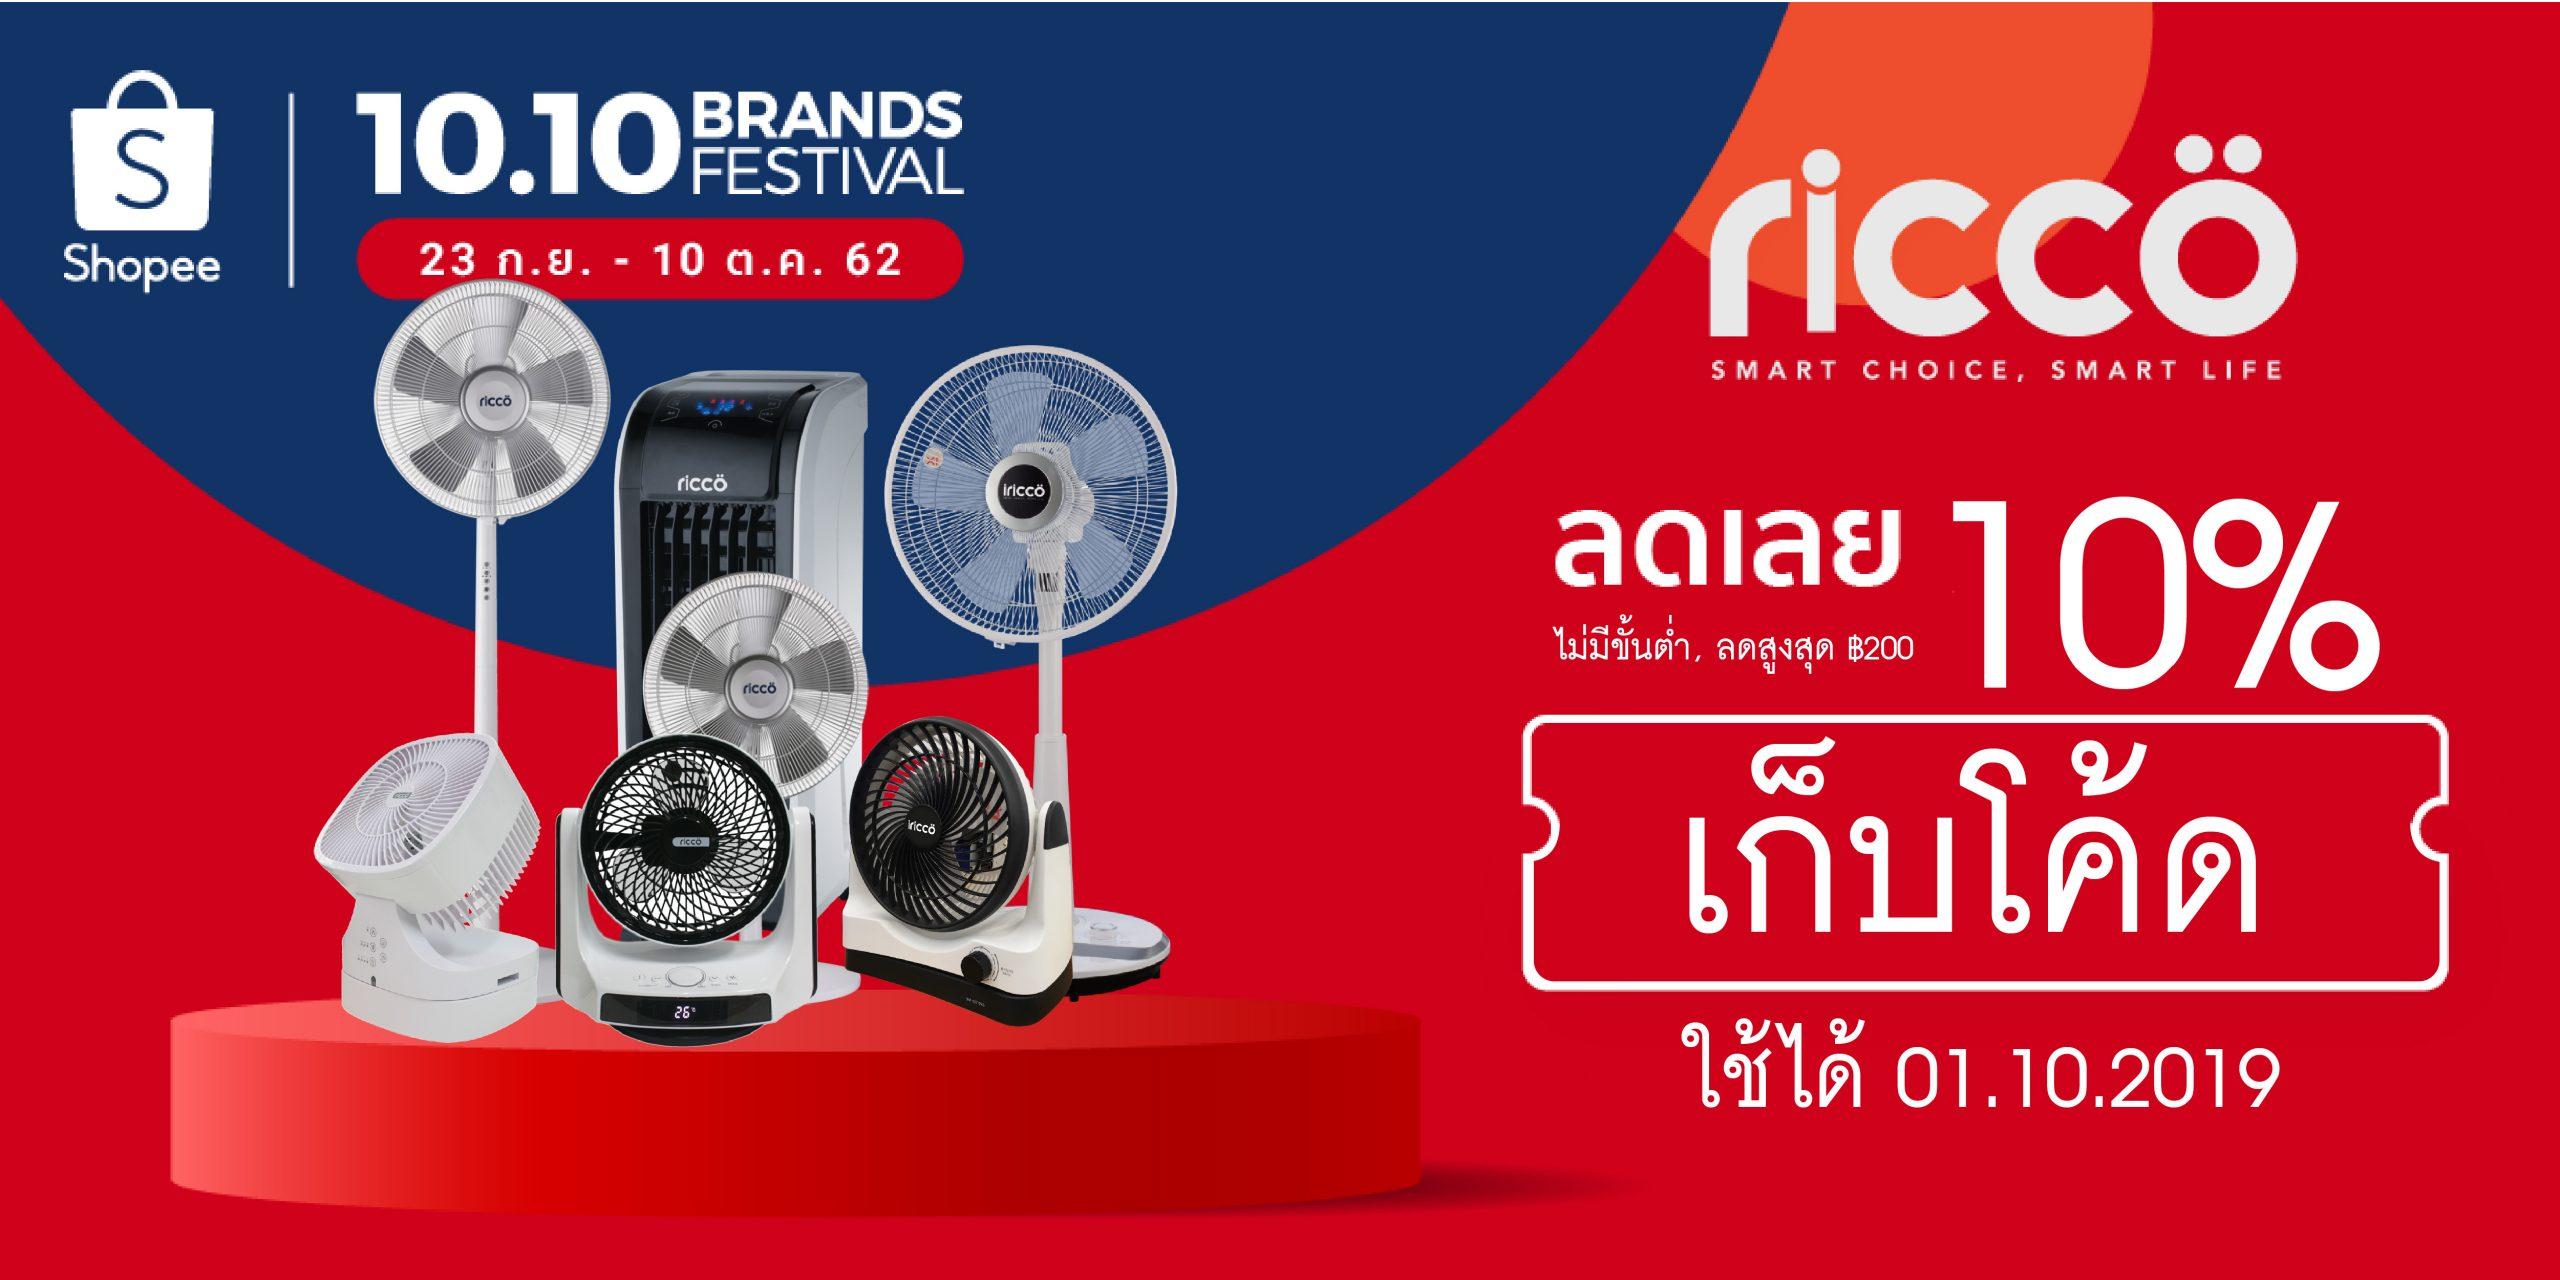 You are currently viewing ricco แจกโค้ดทั้งร้าน 10% 01.10.2019